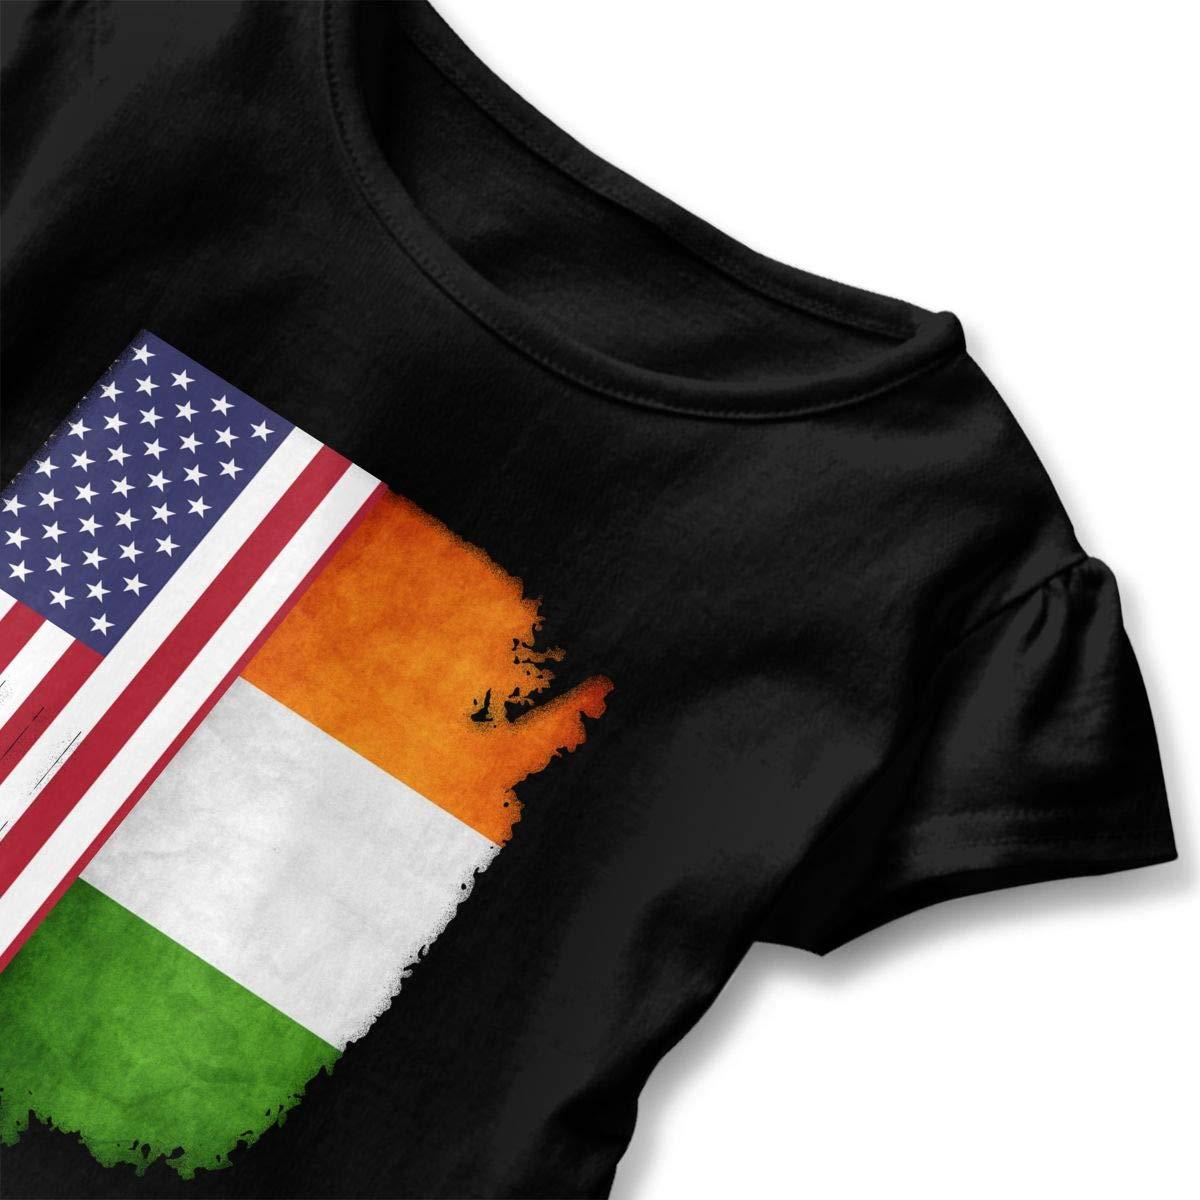 SHIRT1-KIDS Irish American Flag Shirt Toddler//Infant Girls Short Sleeve Ruffles Shirt T-Shirt for 2-6 Toddlers